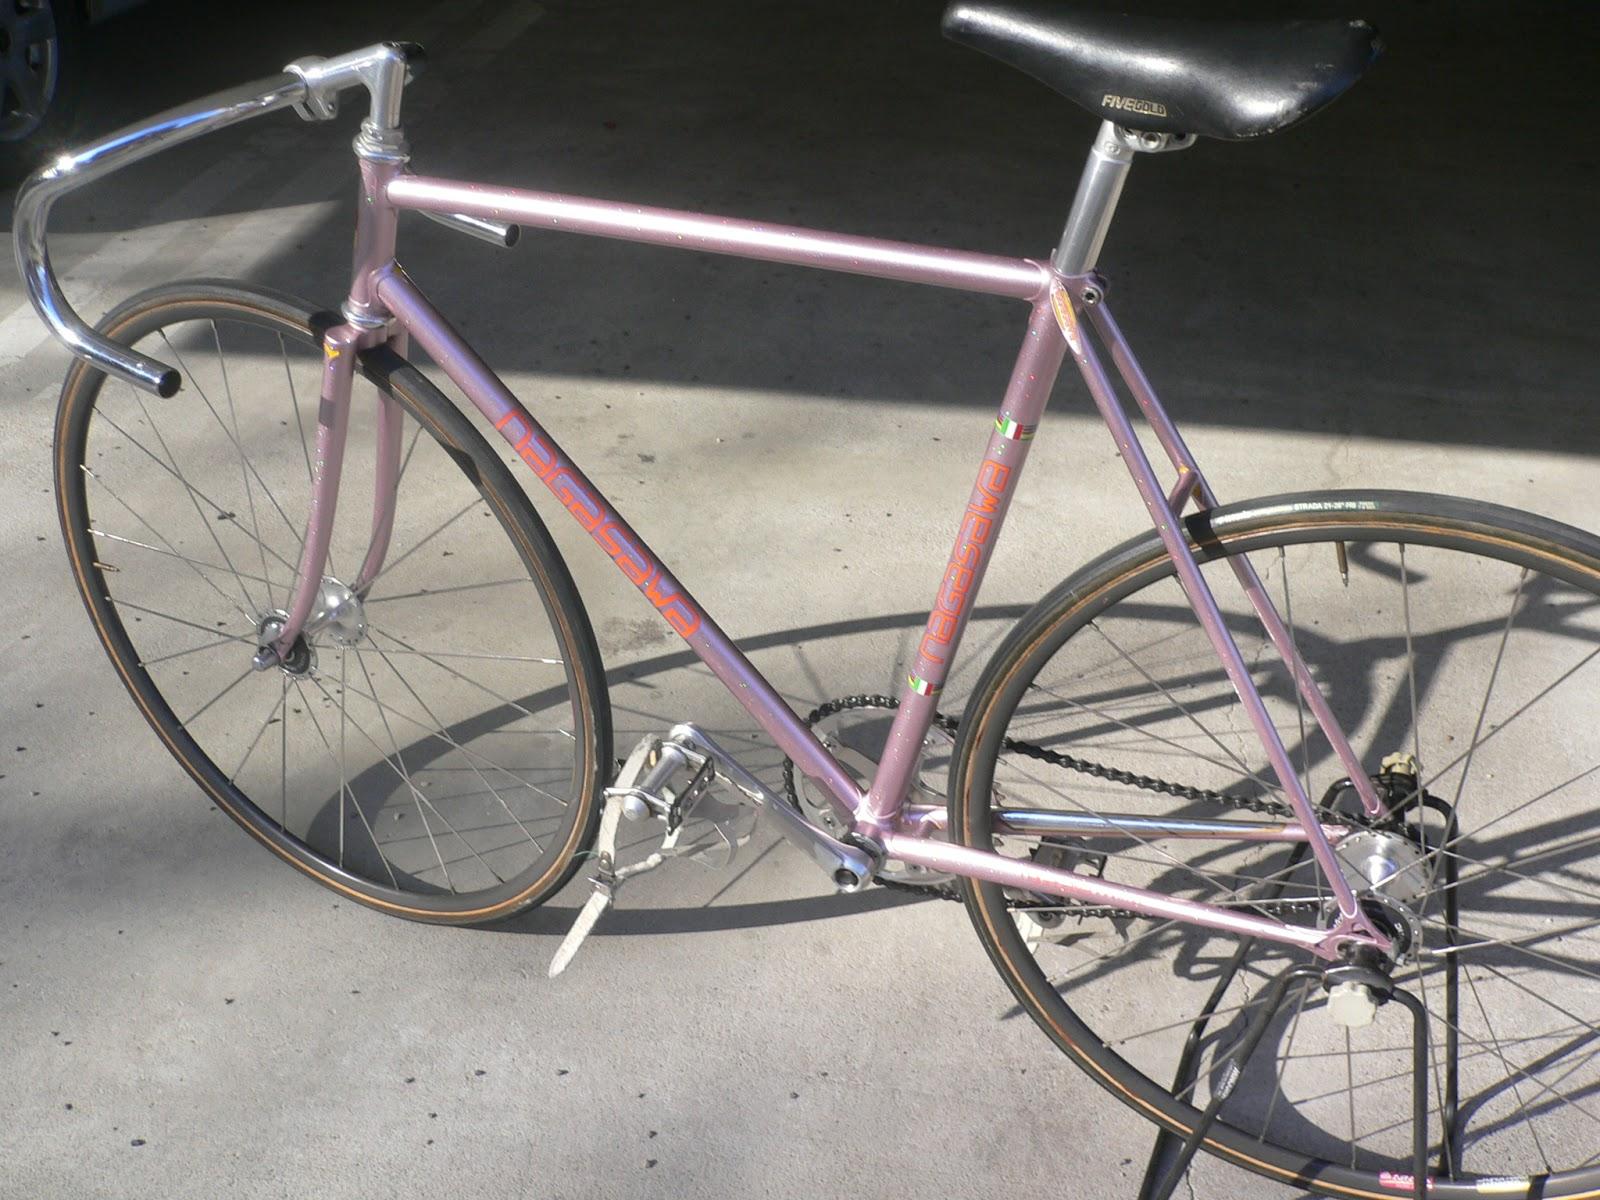 Njs Keirin Track Bike Frame For Sell Nagasawa Njs Keirin Bike